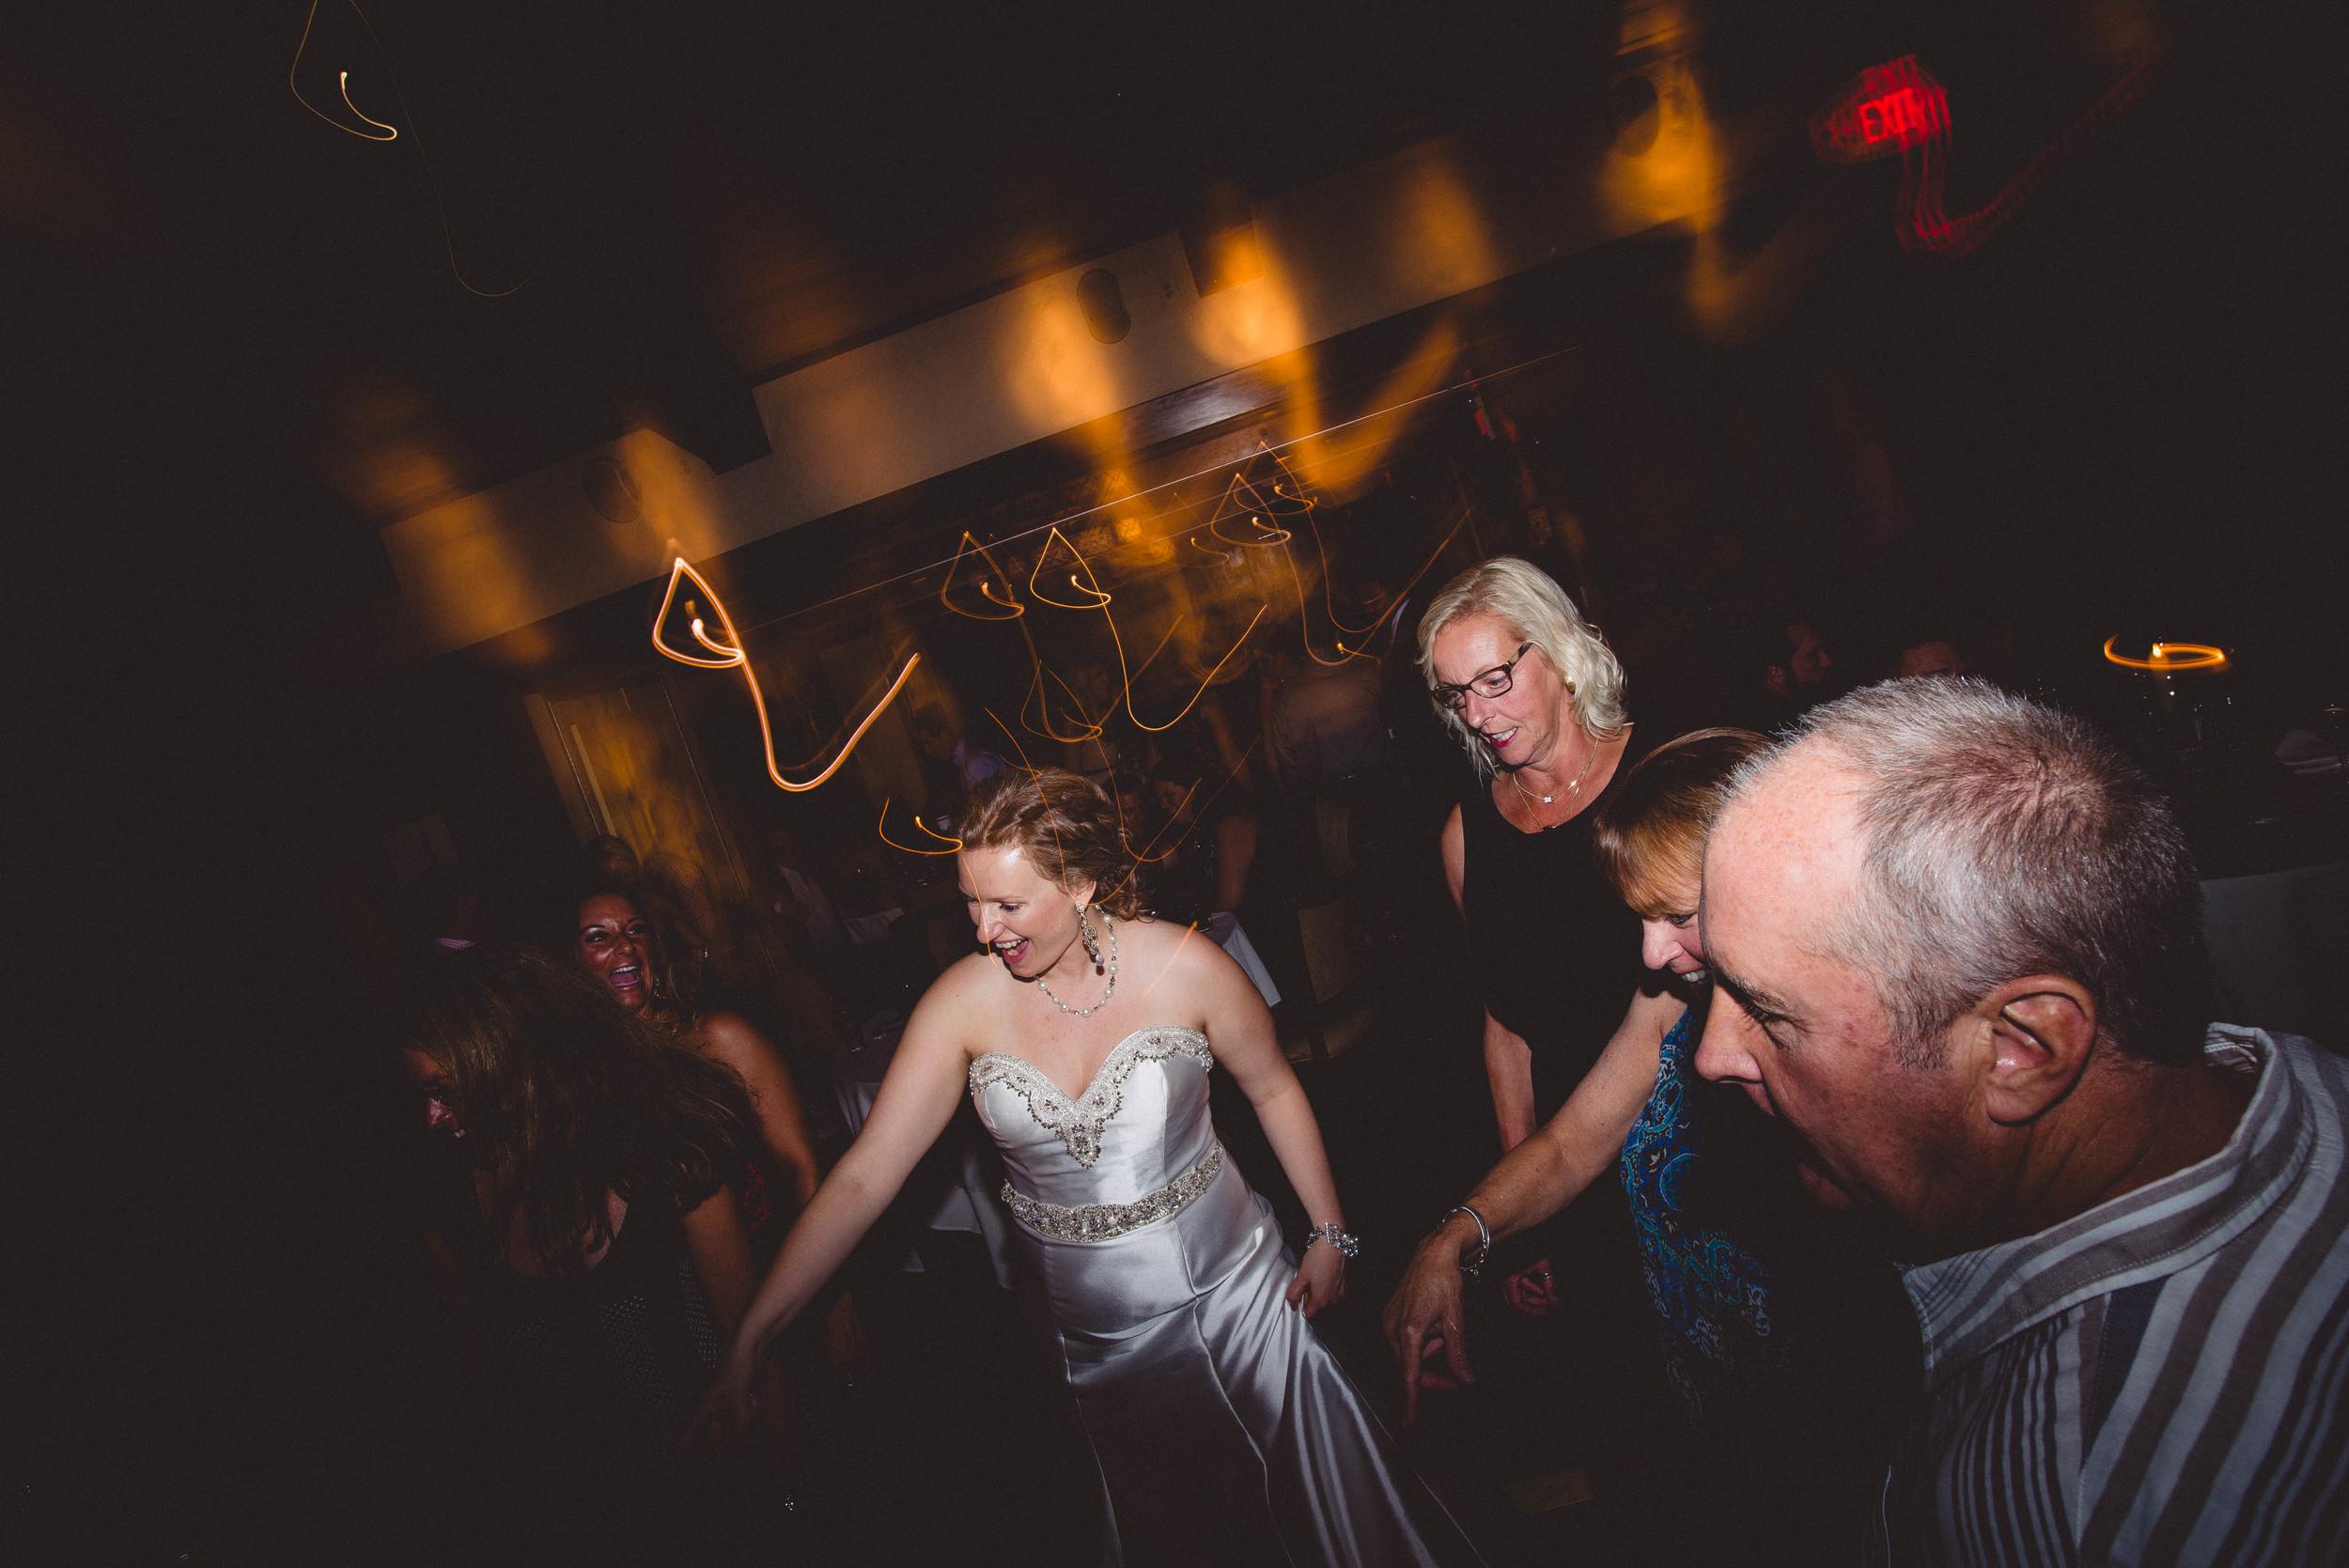 Matt and Shannon Wedding-20160730-21-59-55.JPG